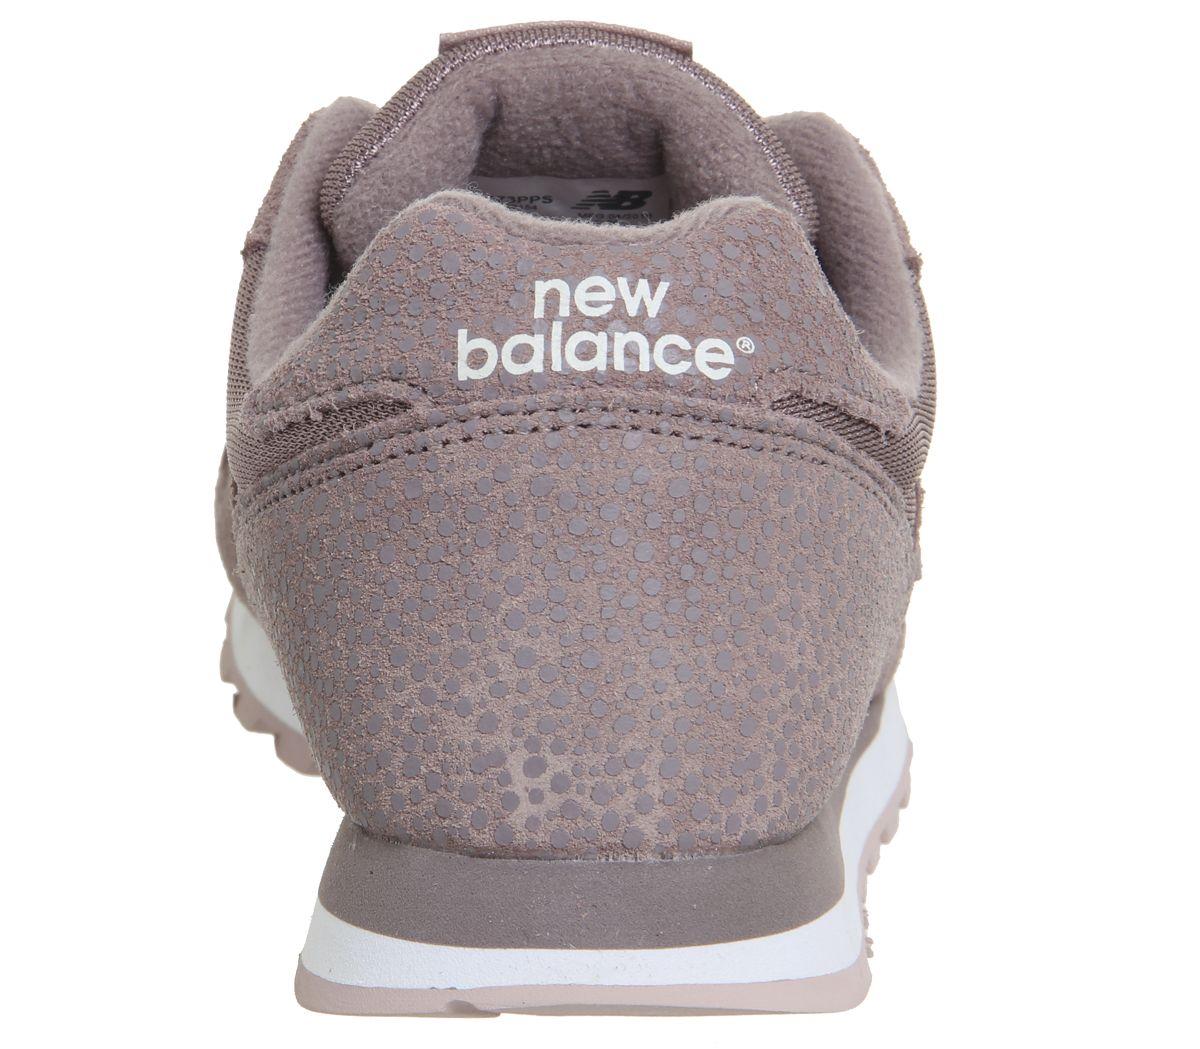 detalles de new balance 373 zapatillas para mujer rosa uk 3